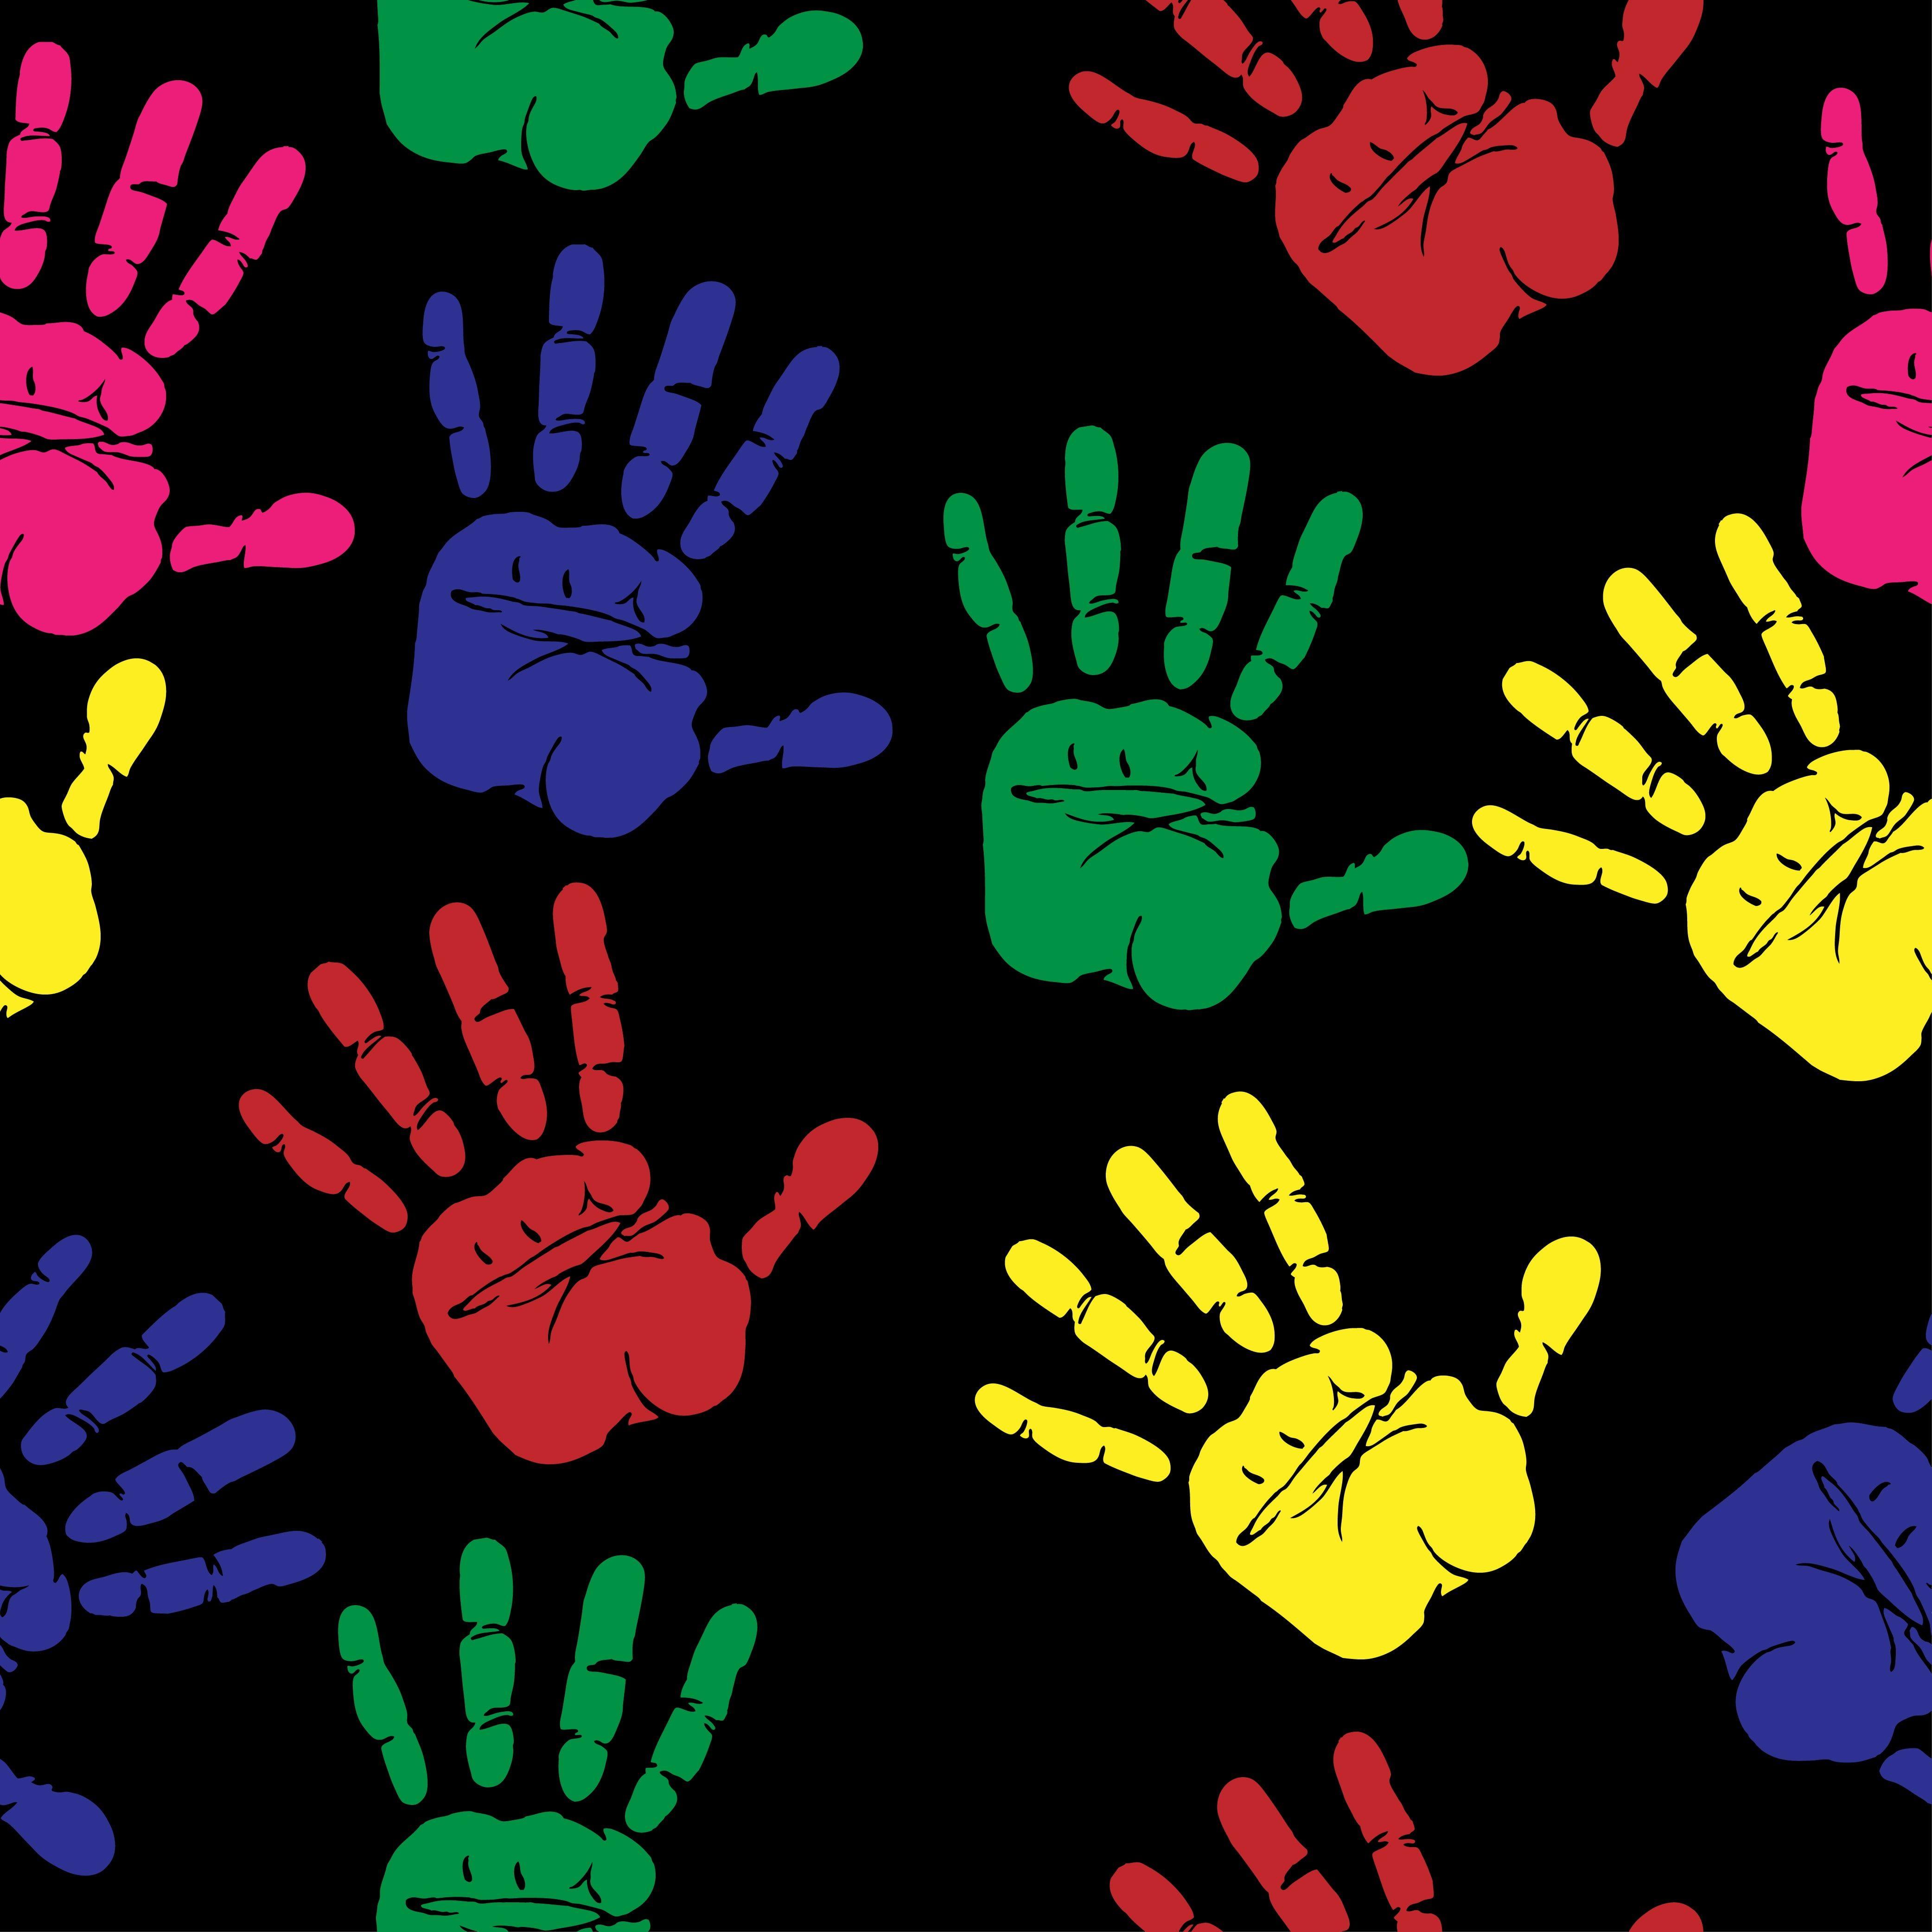 HD wallpaper: assorted-color hand print illustration, hands, prints, art, multi-colored